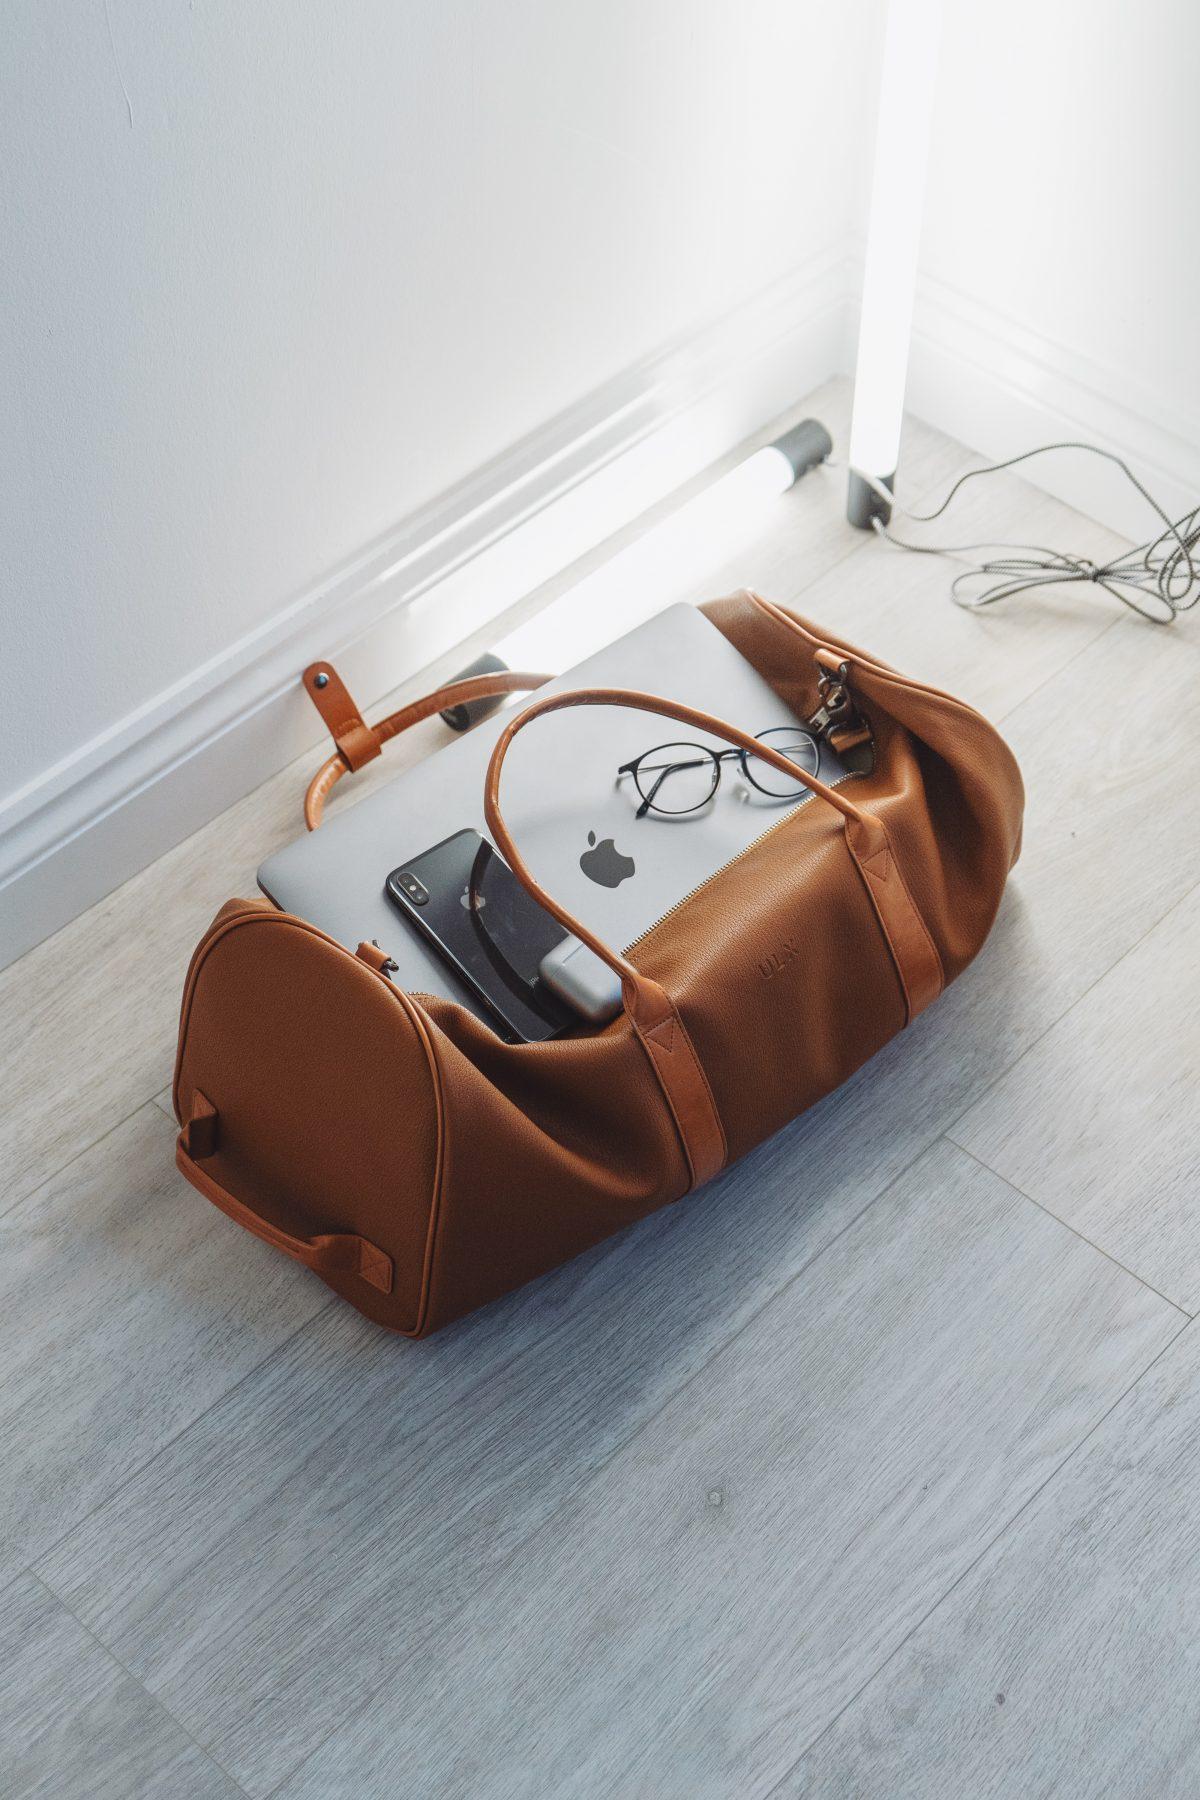 under-seat luggage